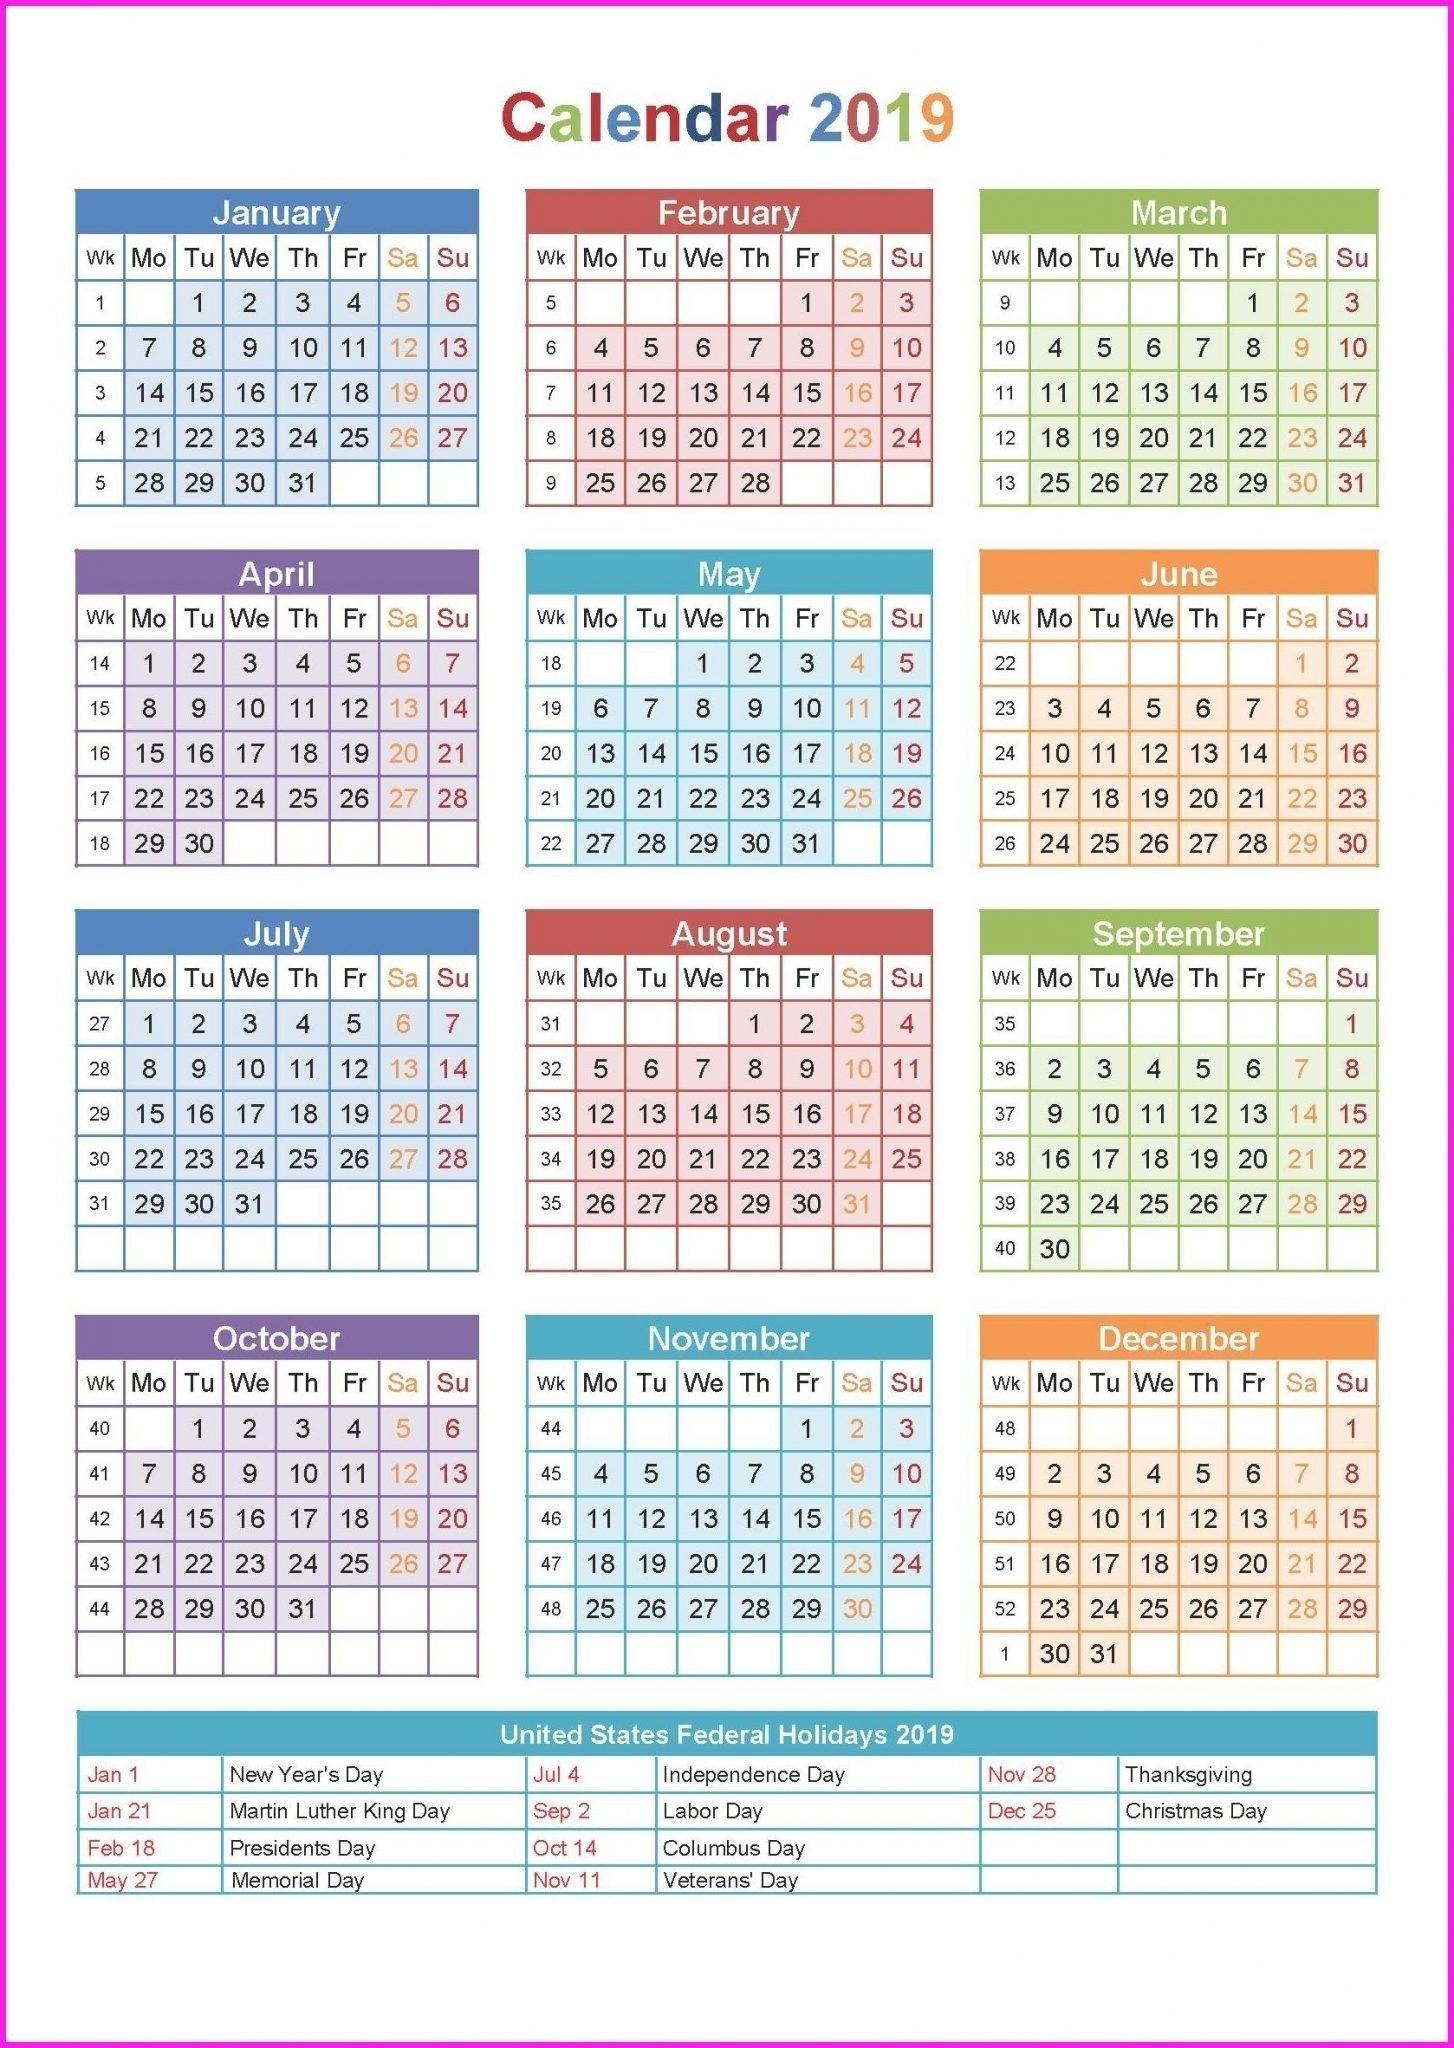 Free Yearly 5.5 X 8.5 Calendar 2020 - Calendar Inspiration Design